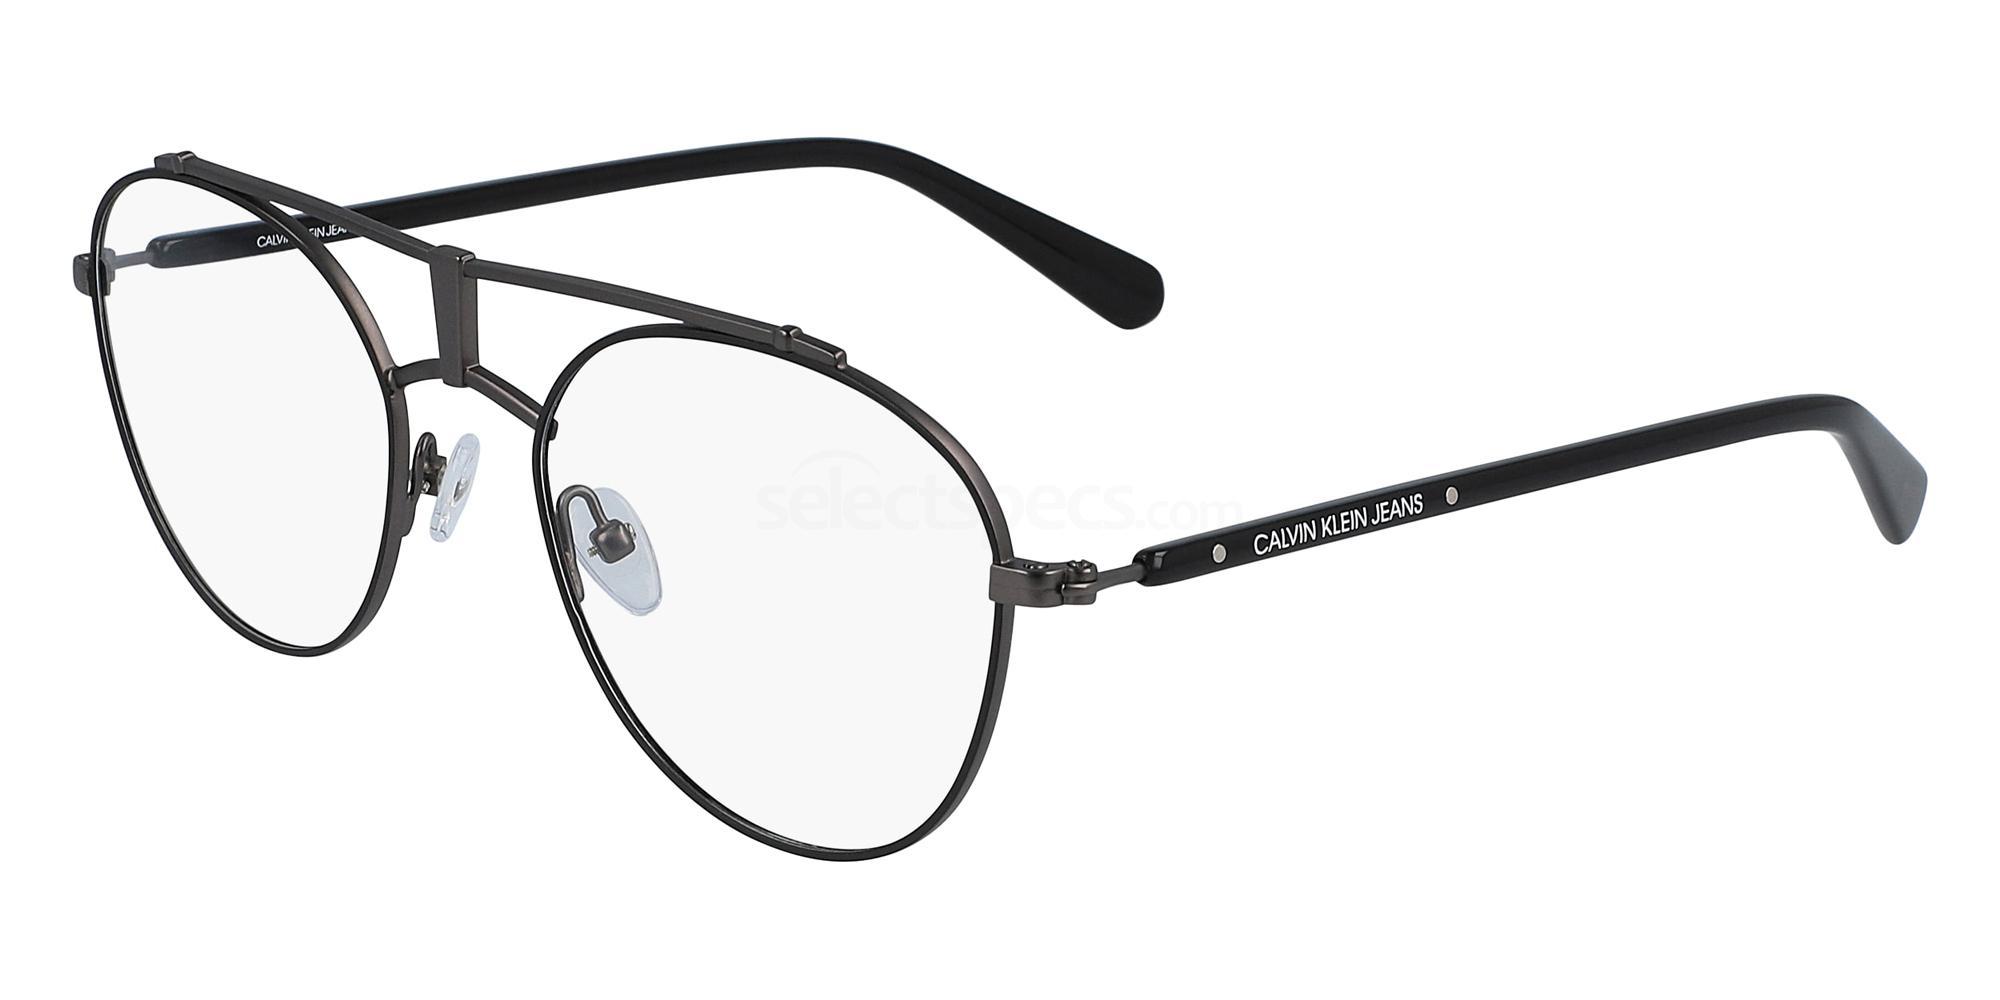 001 CKJ19310 Glasses, Calvin Klein Jeans